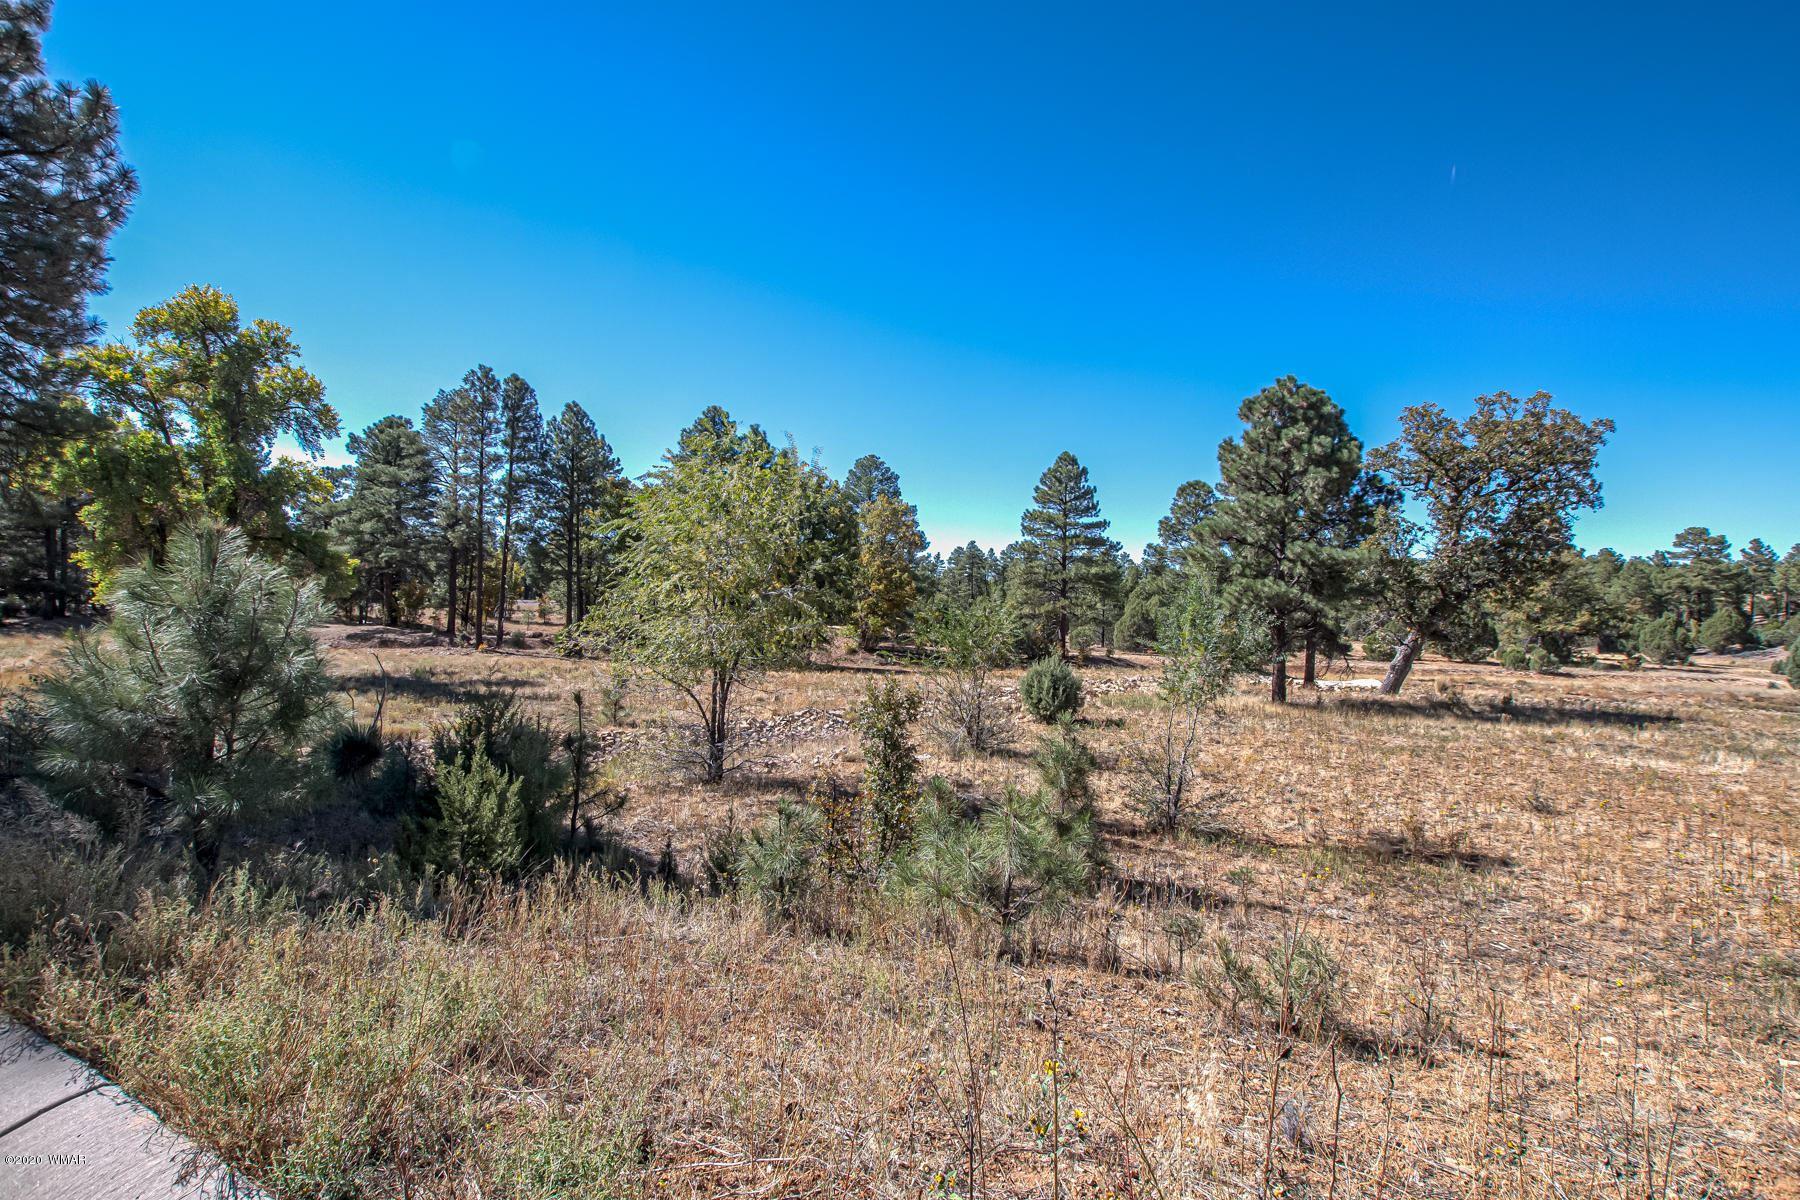 Photo for 180 E Summerberry Drive, Show Low, AZ 85901 (MLS # 232548)